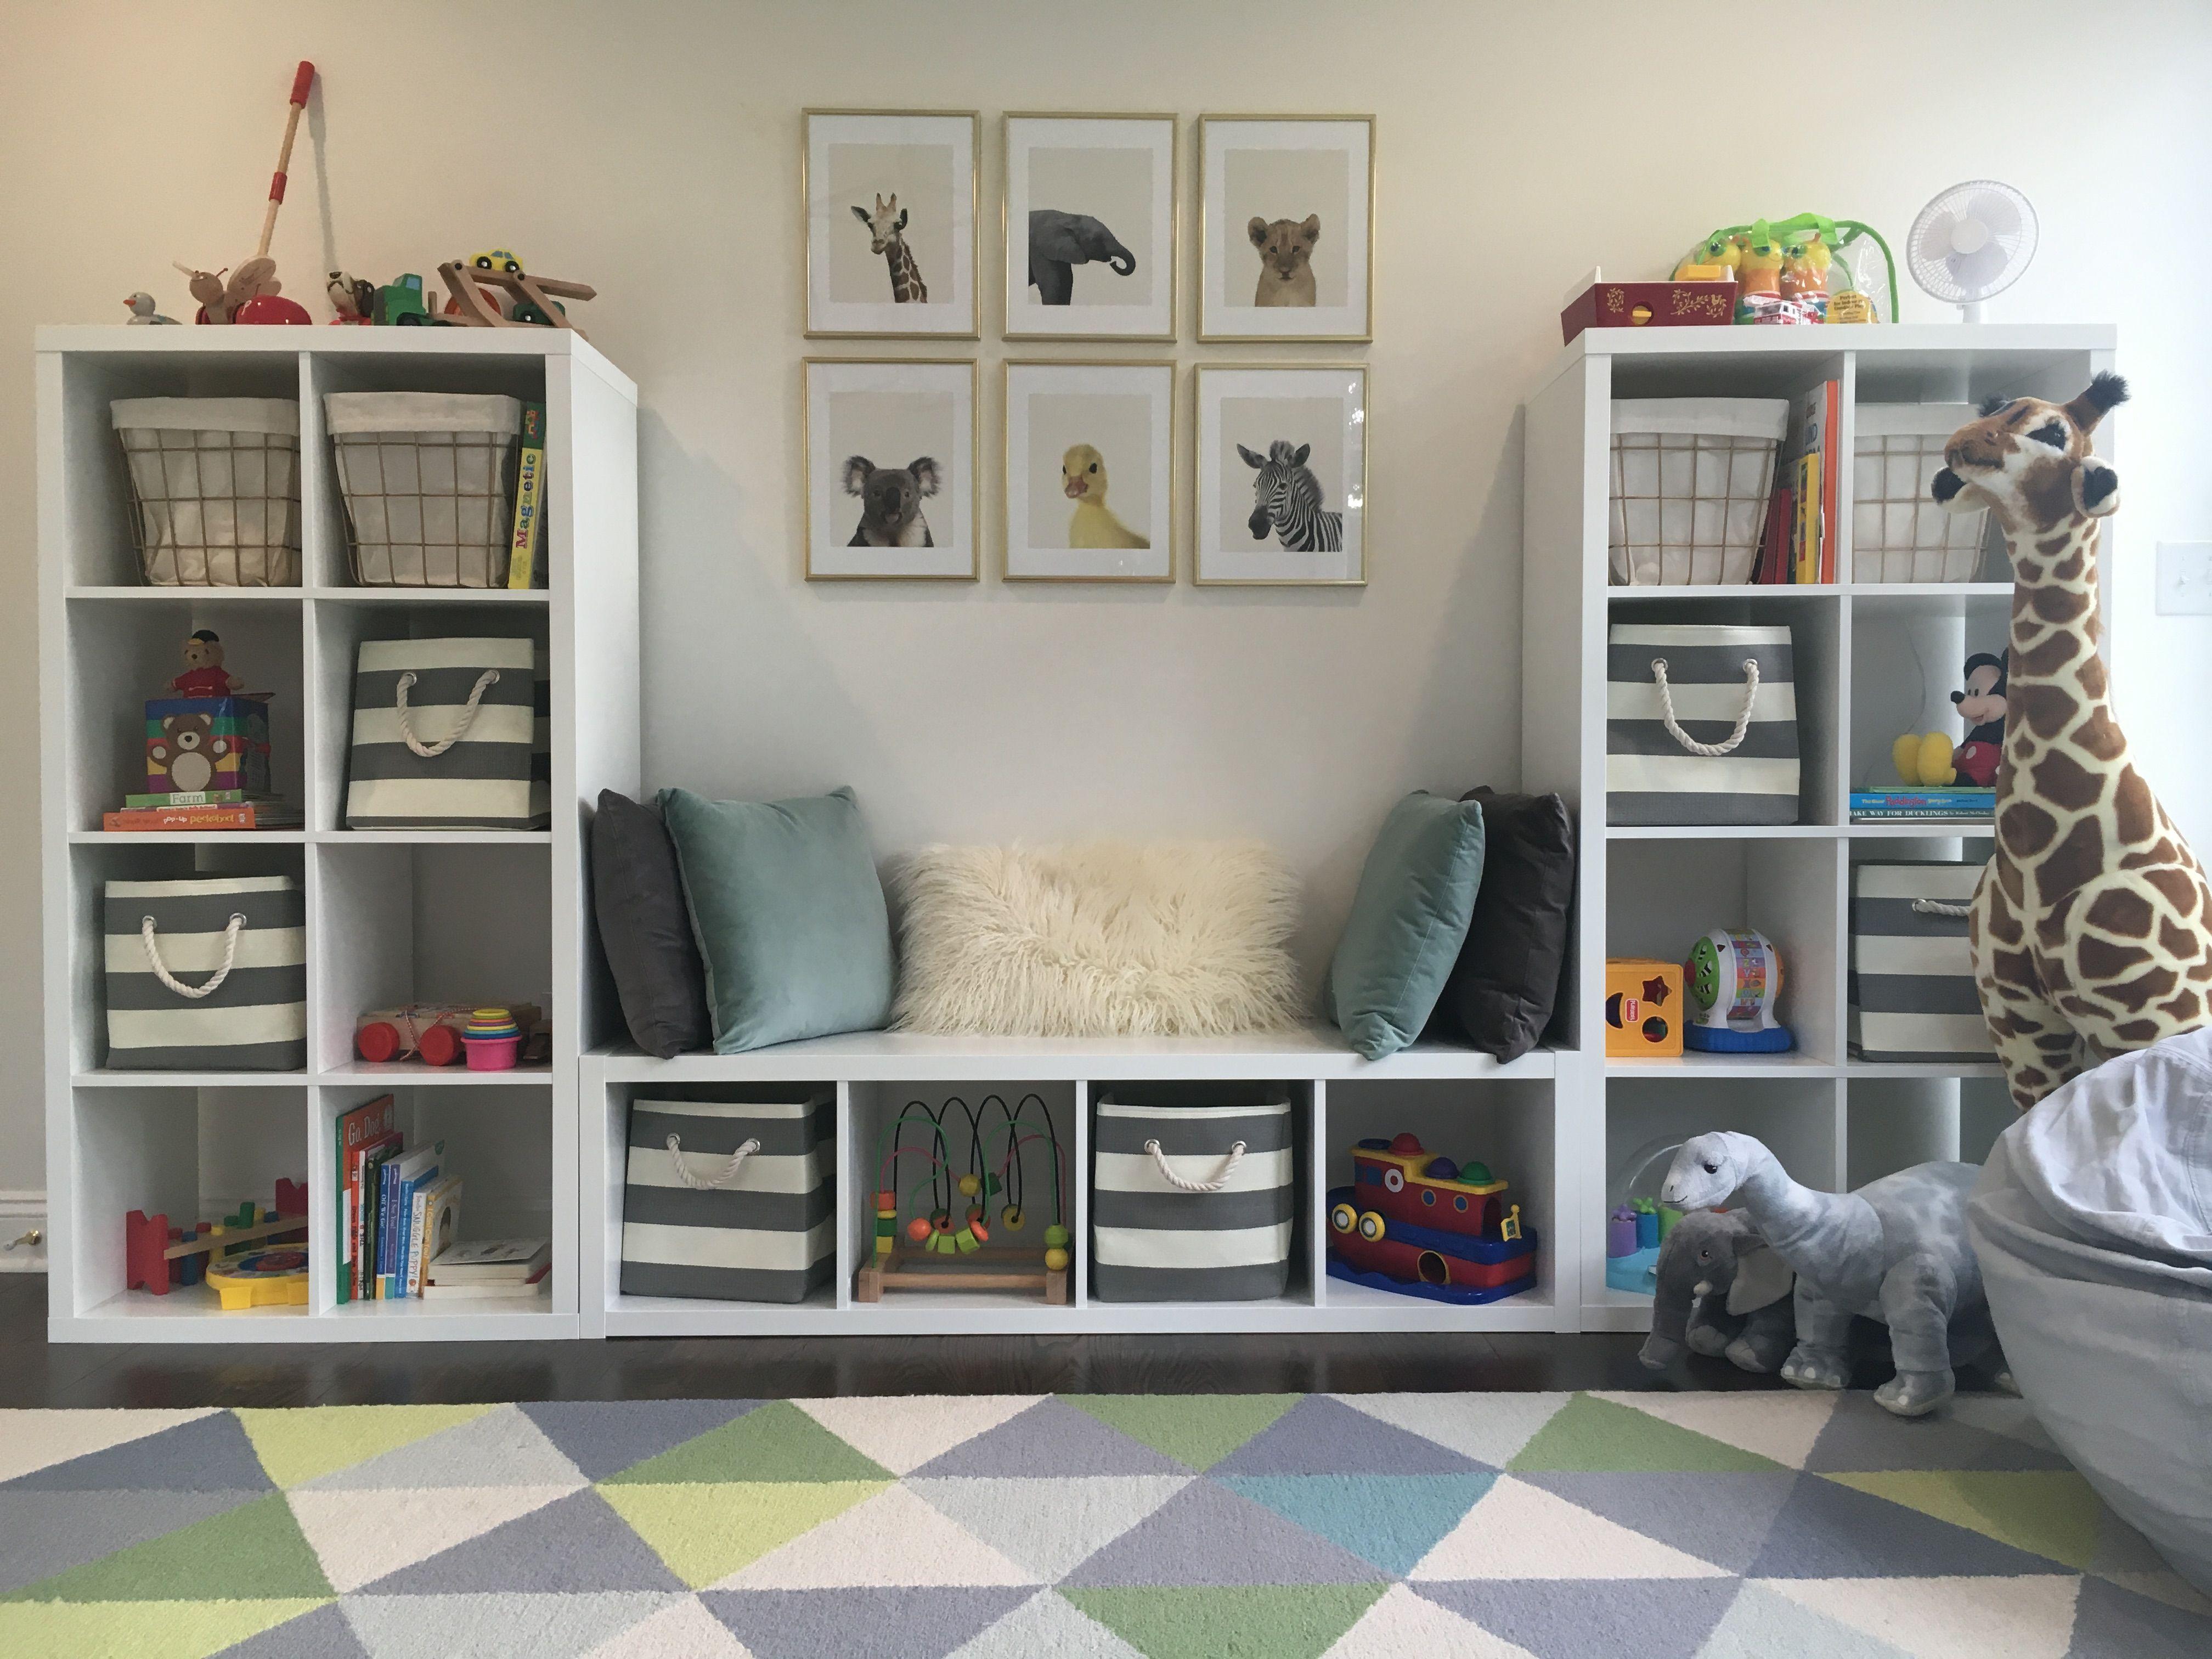 7 1 Toy Storage Ideas 2019 Diy Plans In A Small Space Li